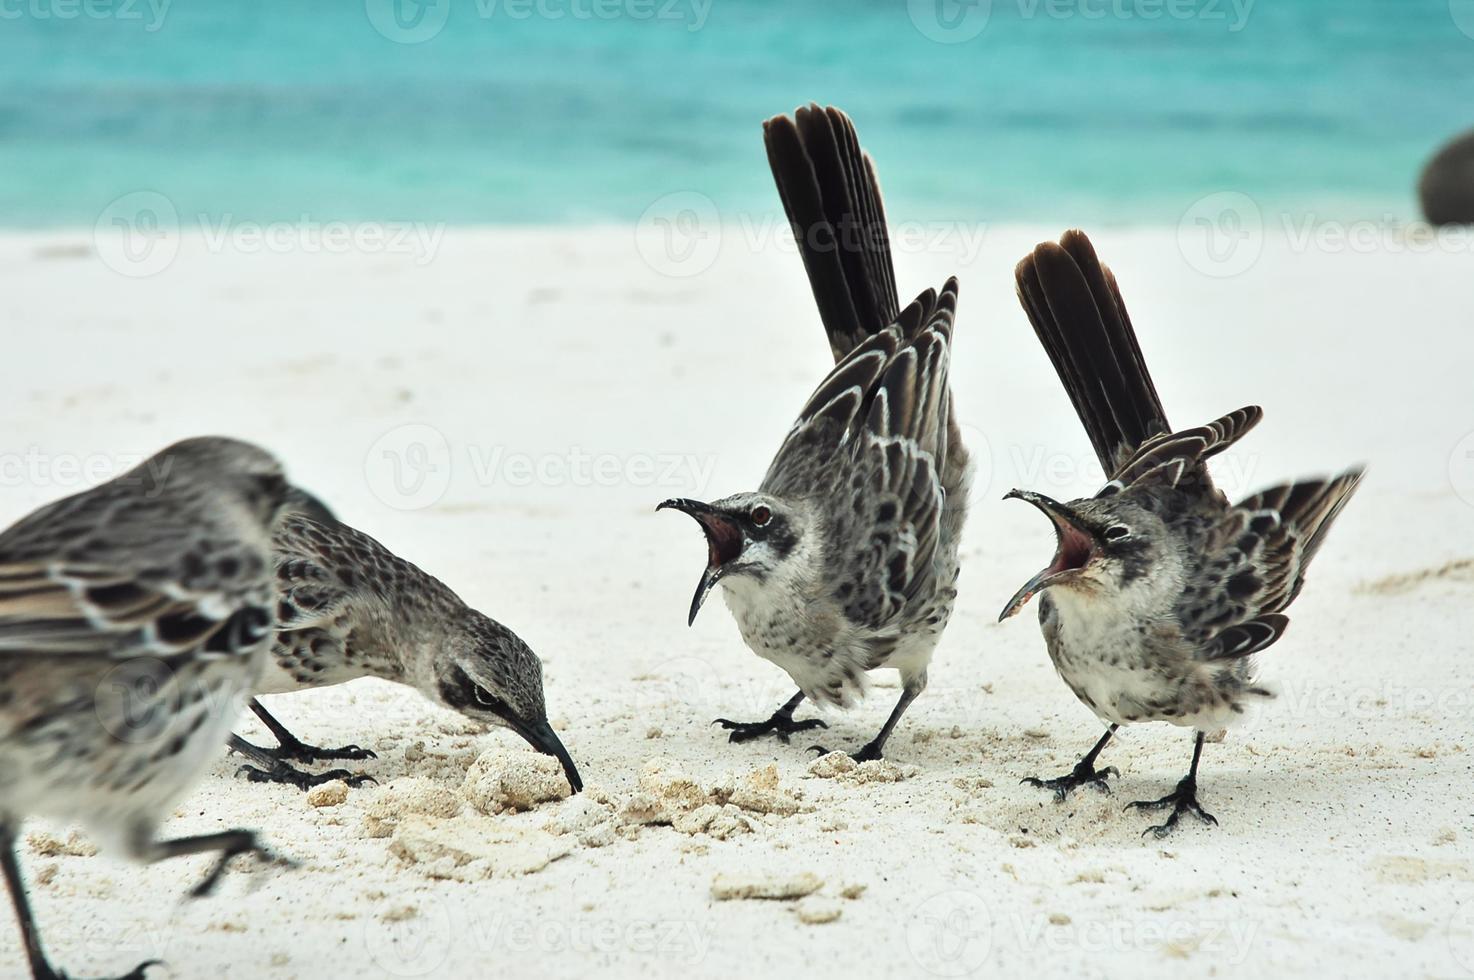 galapagos spotlijster. foto